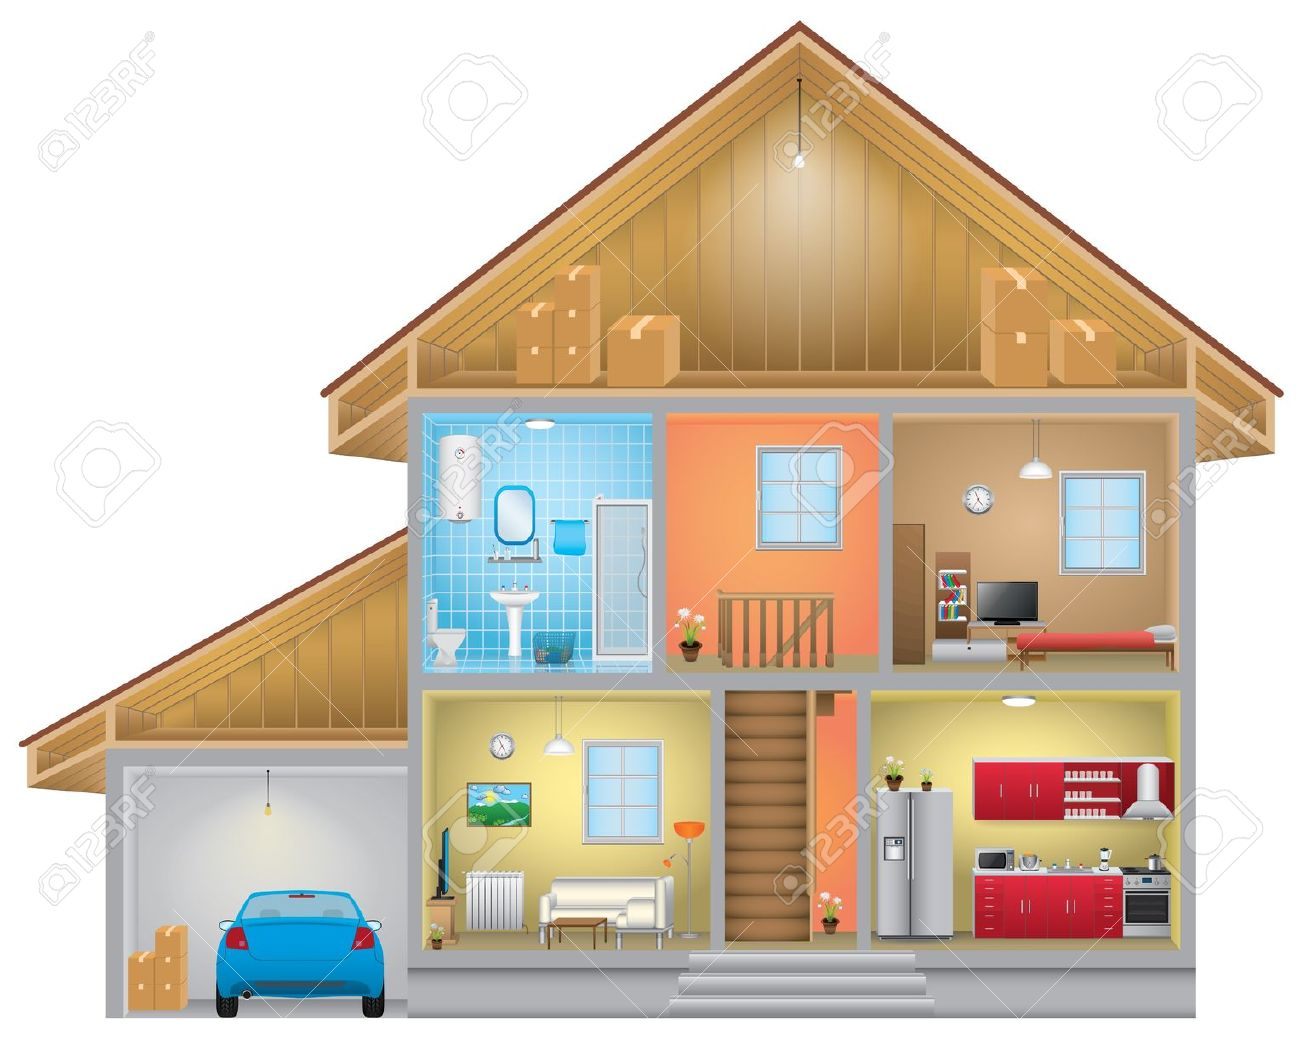 House clipart my house House Clipart clipart Inside my